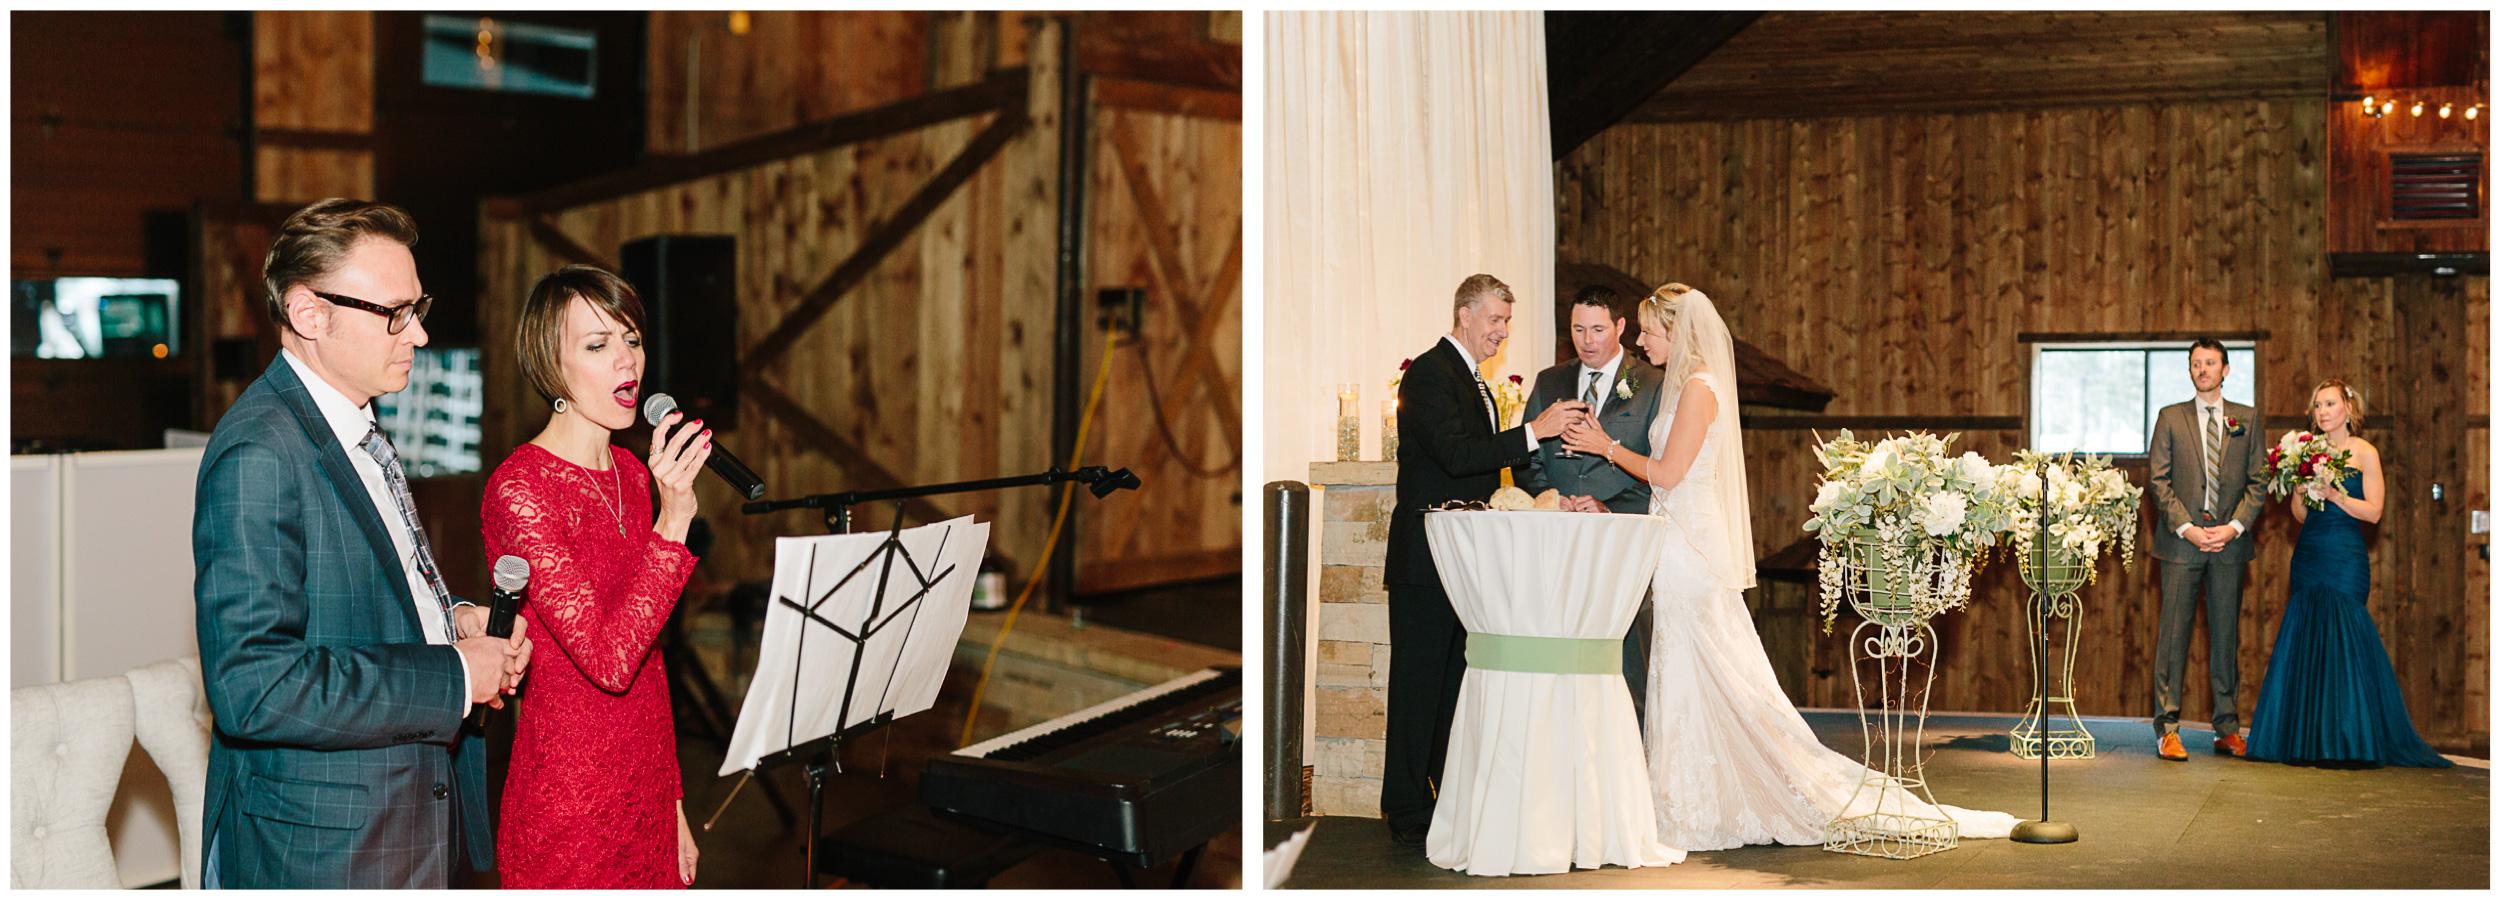 spruce_mountain_ranch_wedding_48.jpg